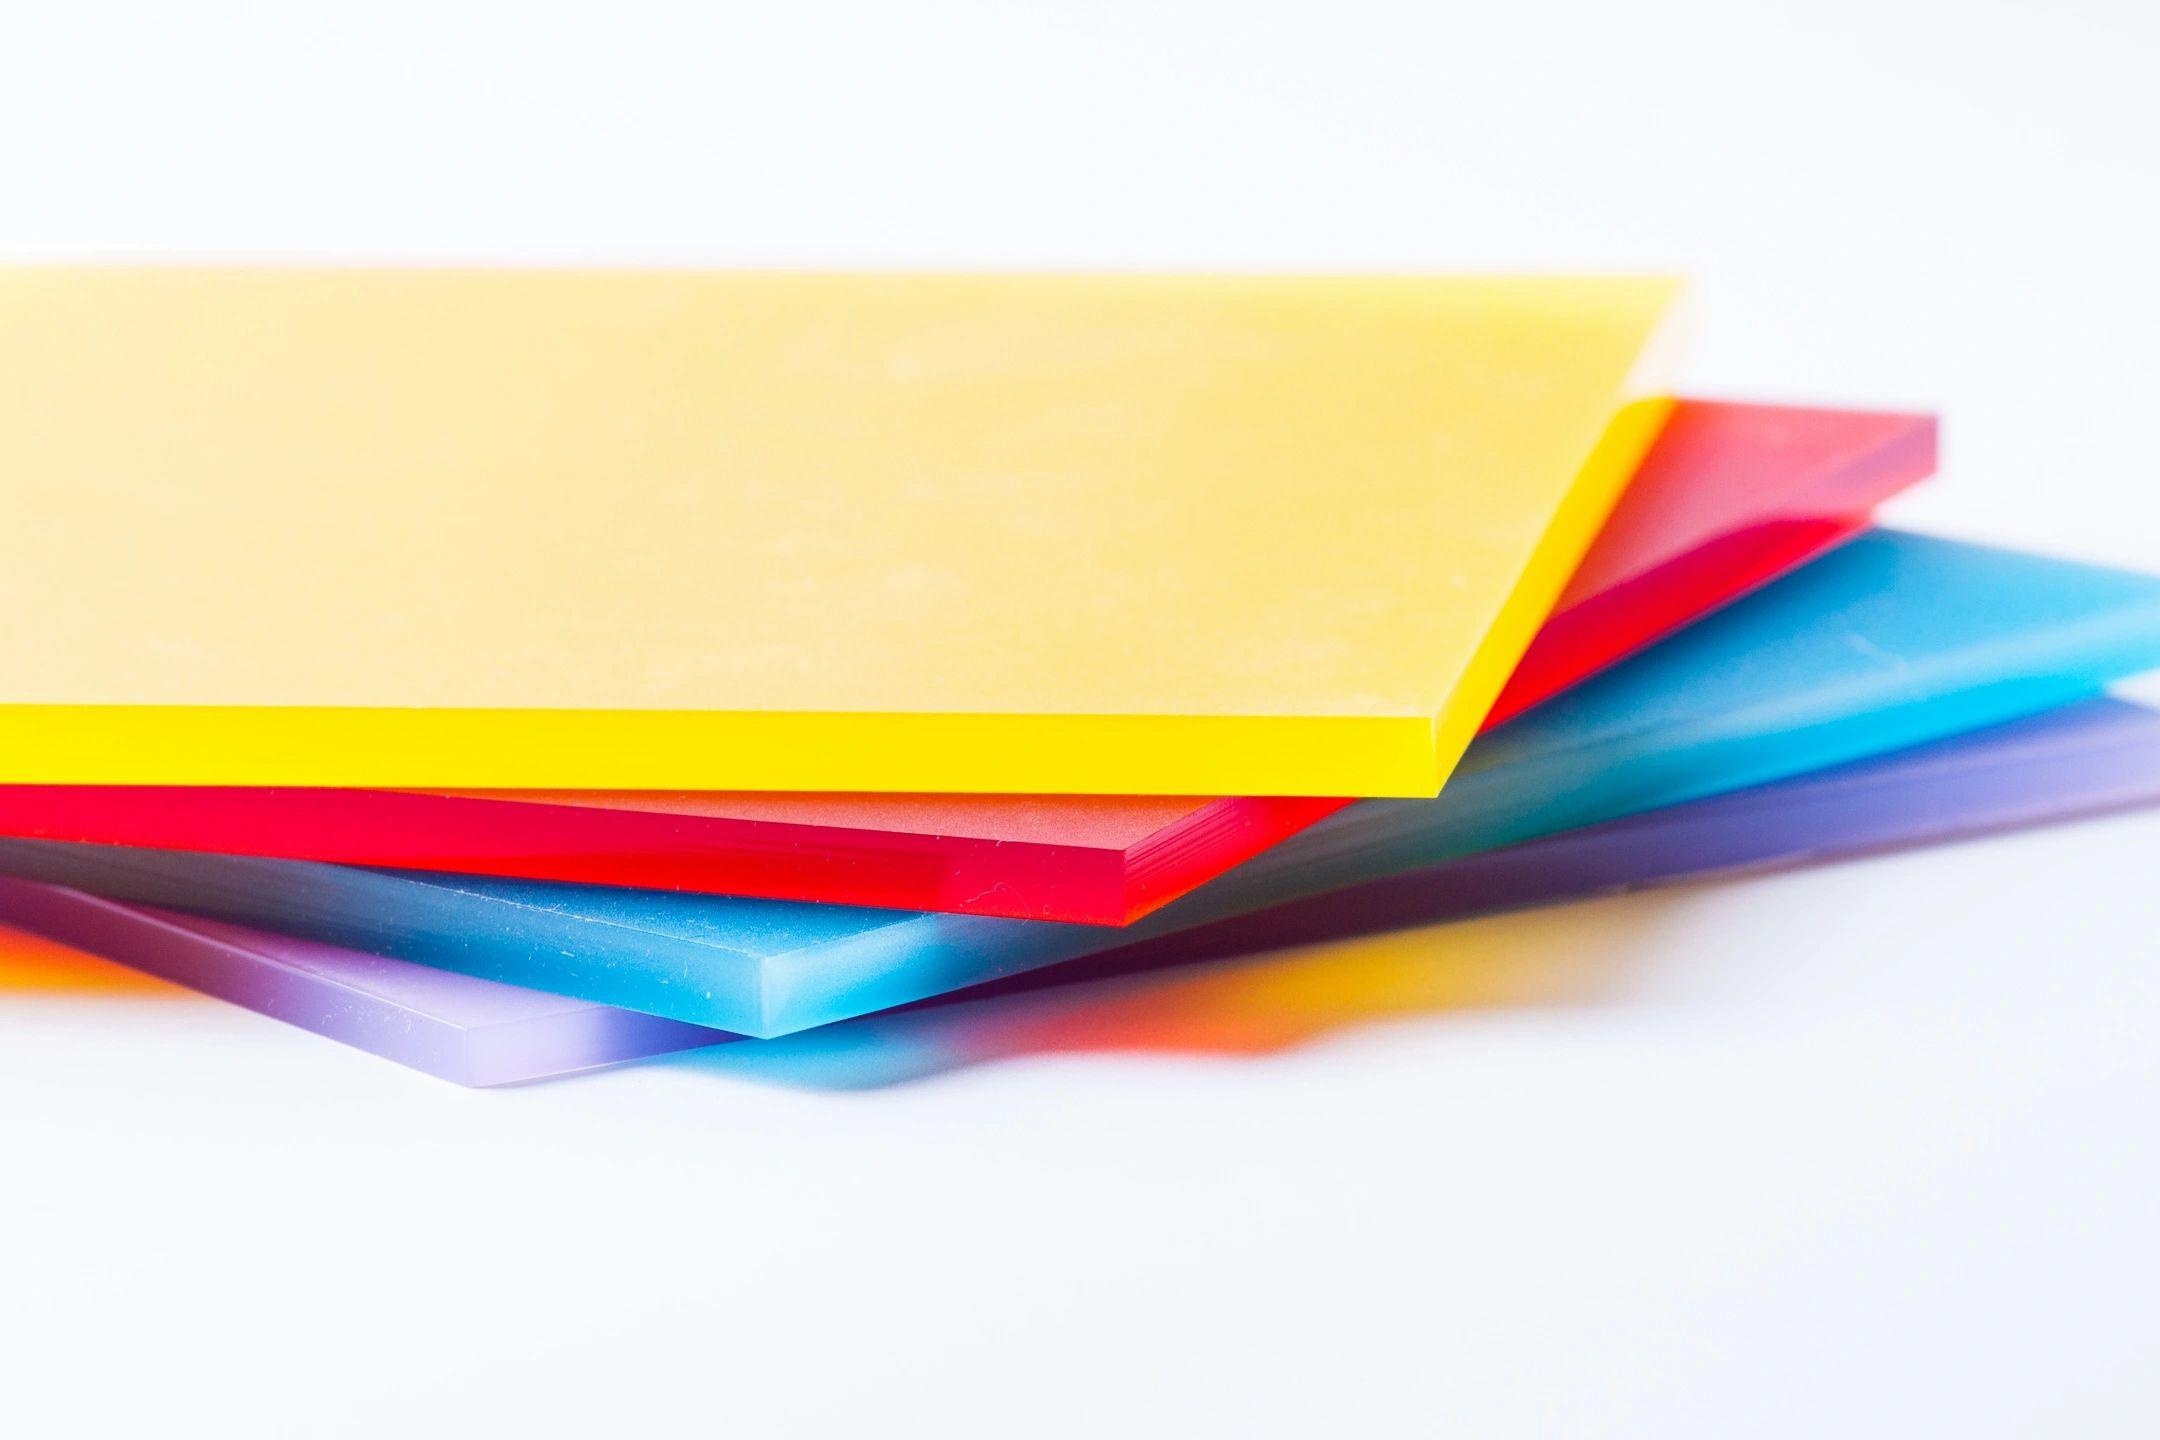 SIBE-R Plastics Supply ADDITIONAL CUTS PER SHEET